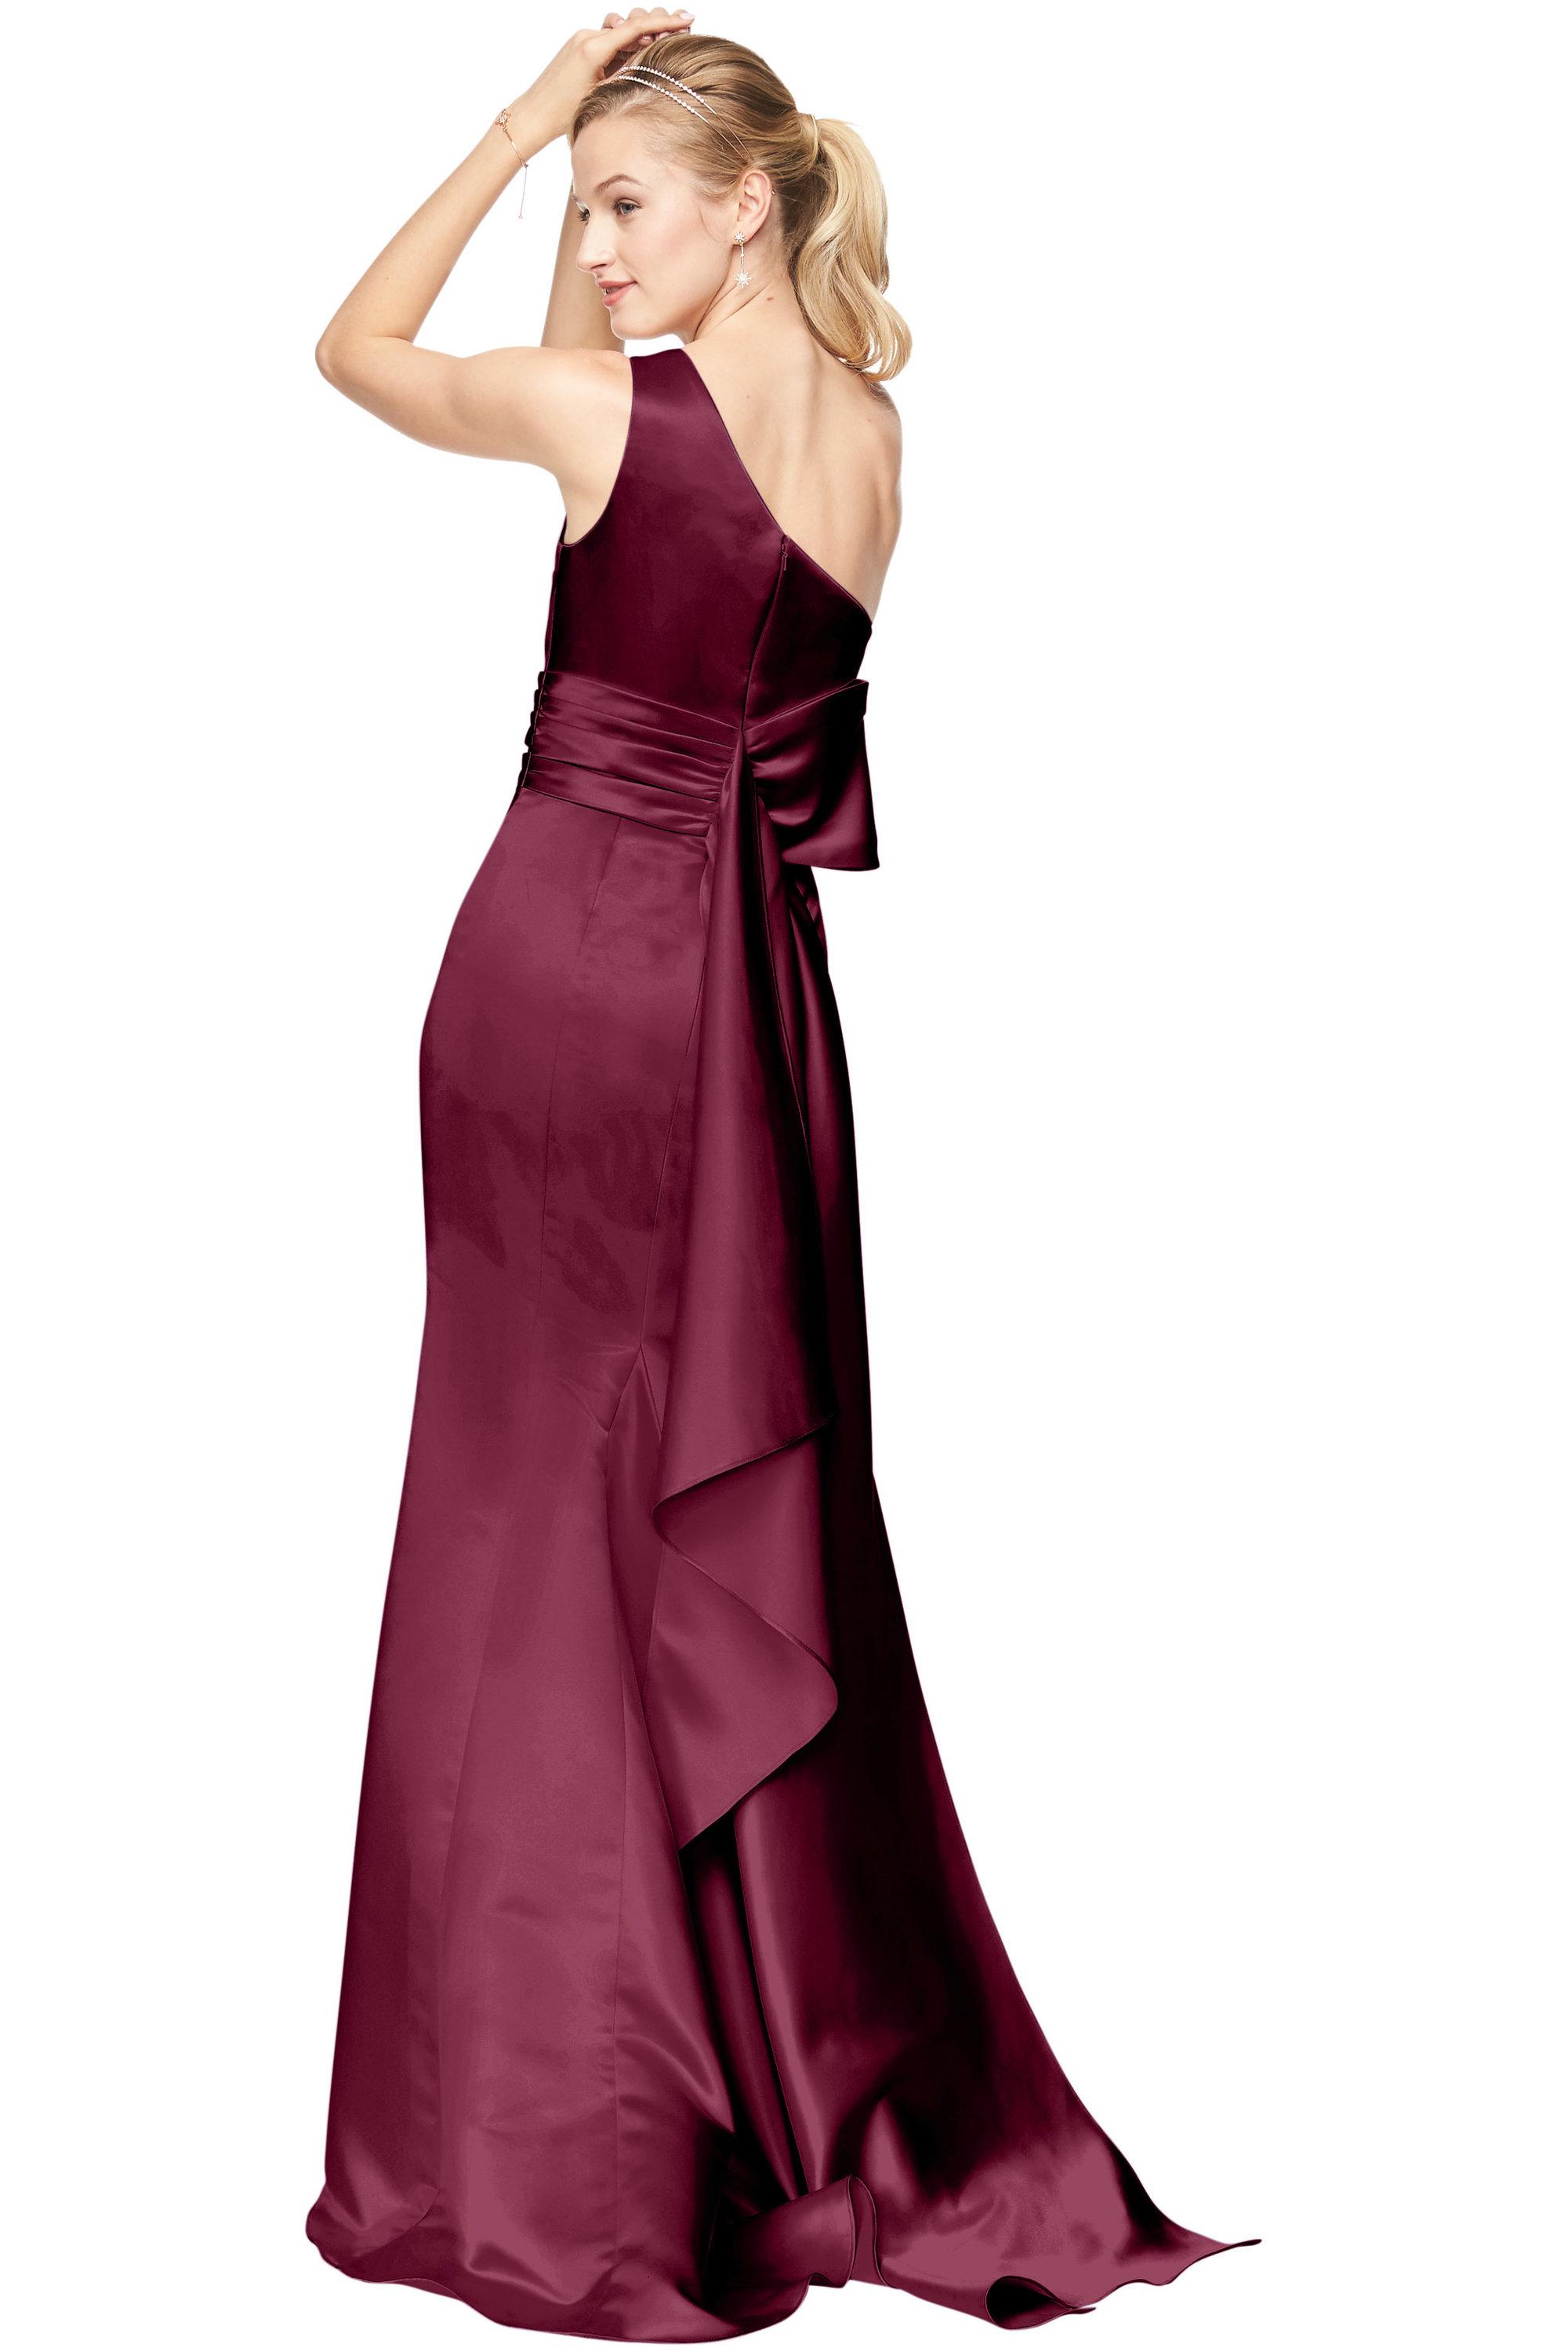 Bill Levkoff EURO WINE Euro Satin One-Shoulder A-Line gown, $178.50 Back